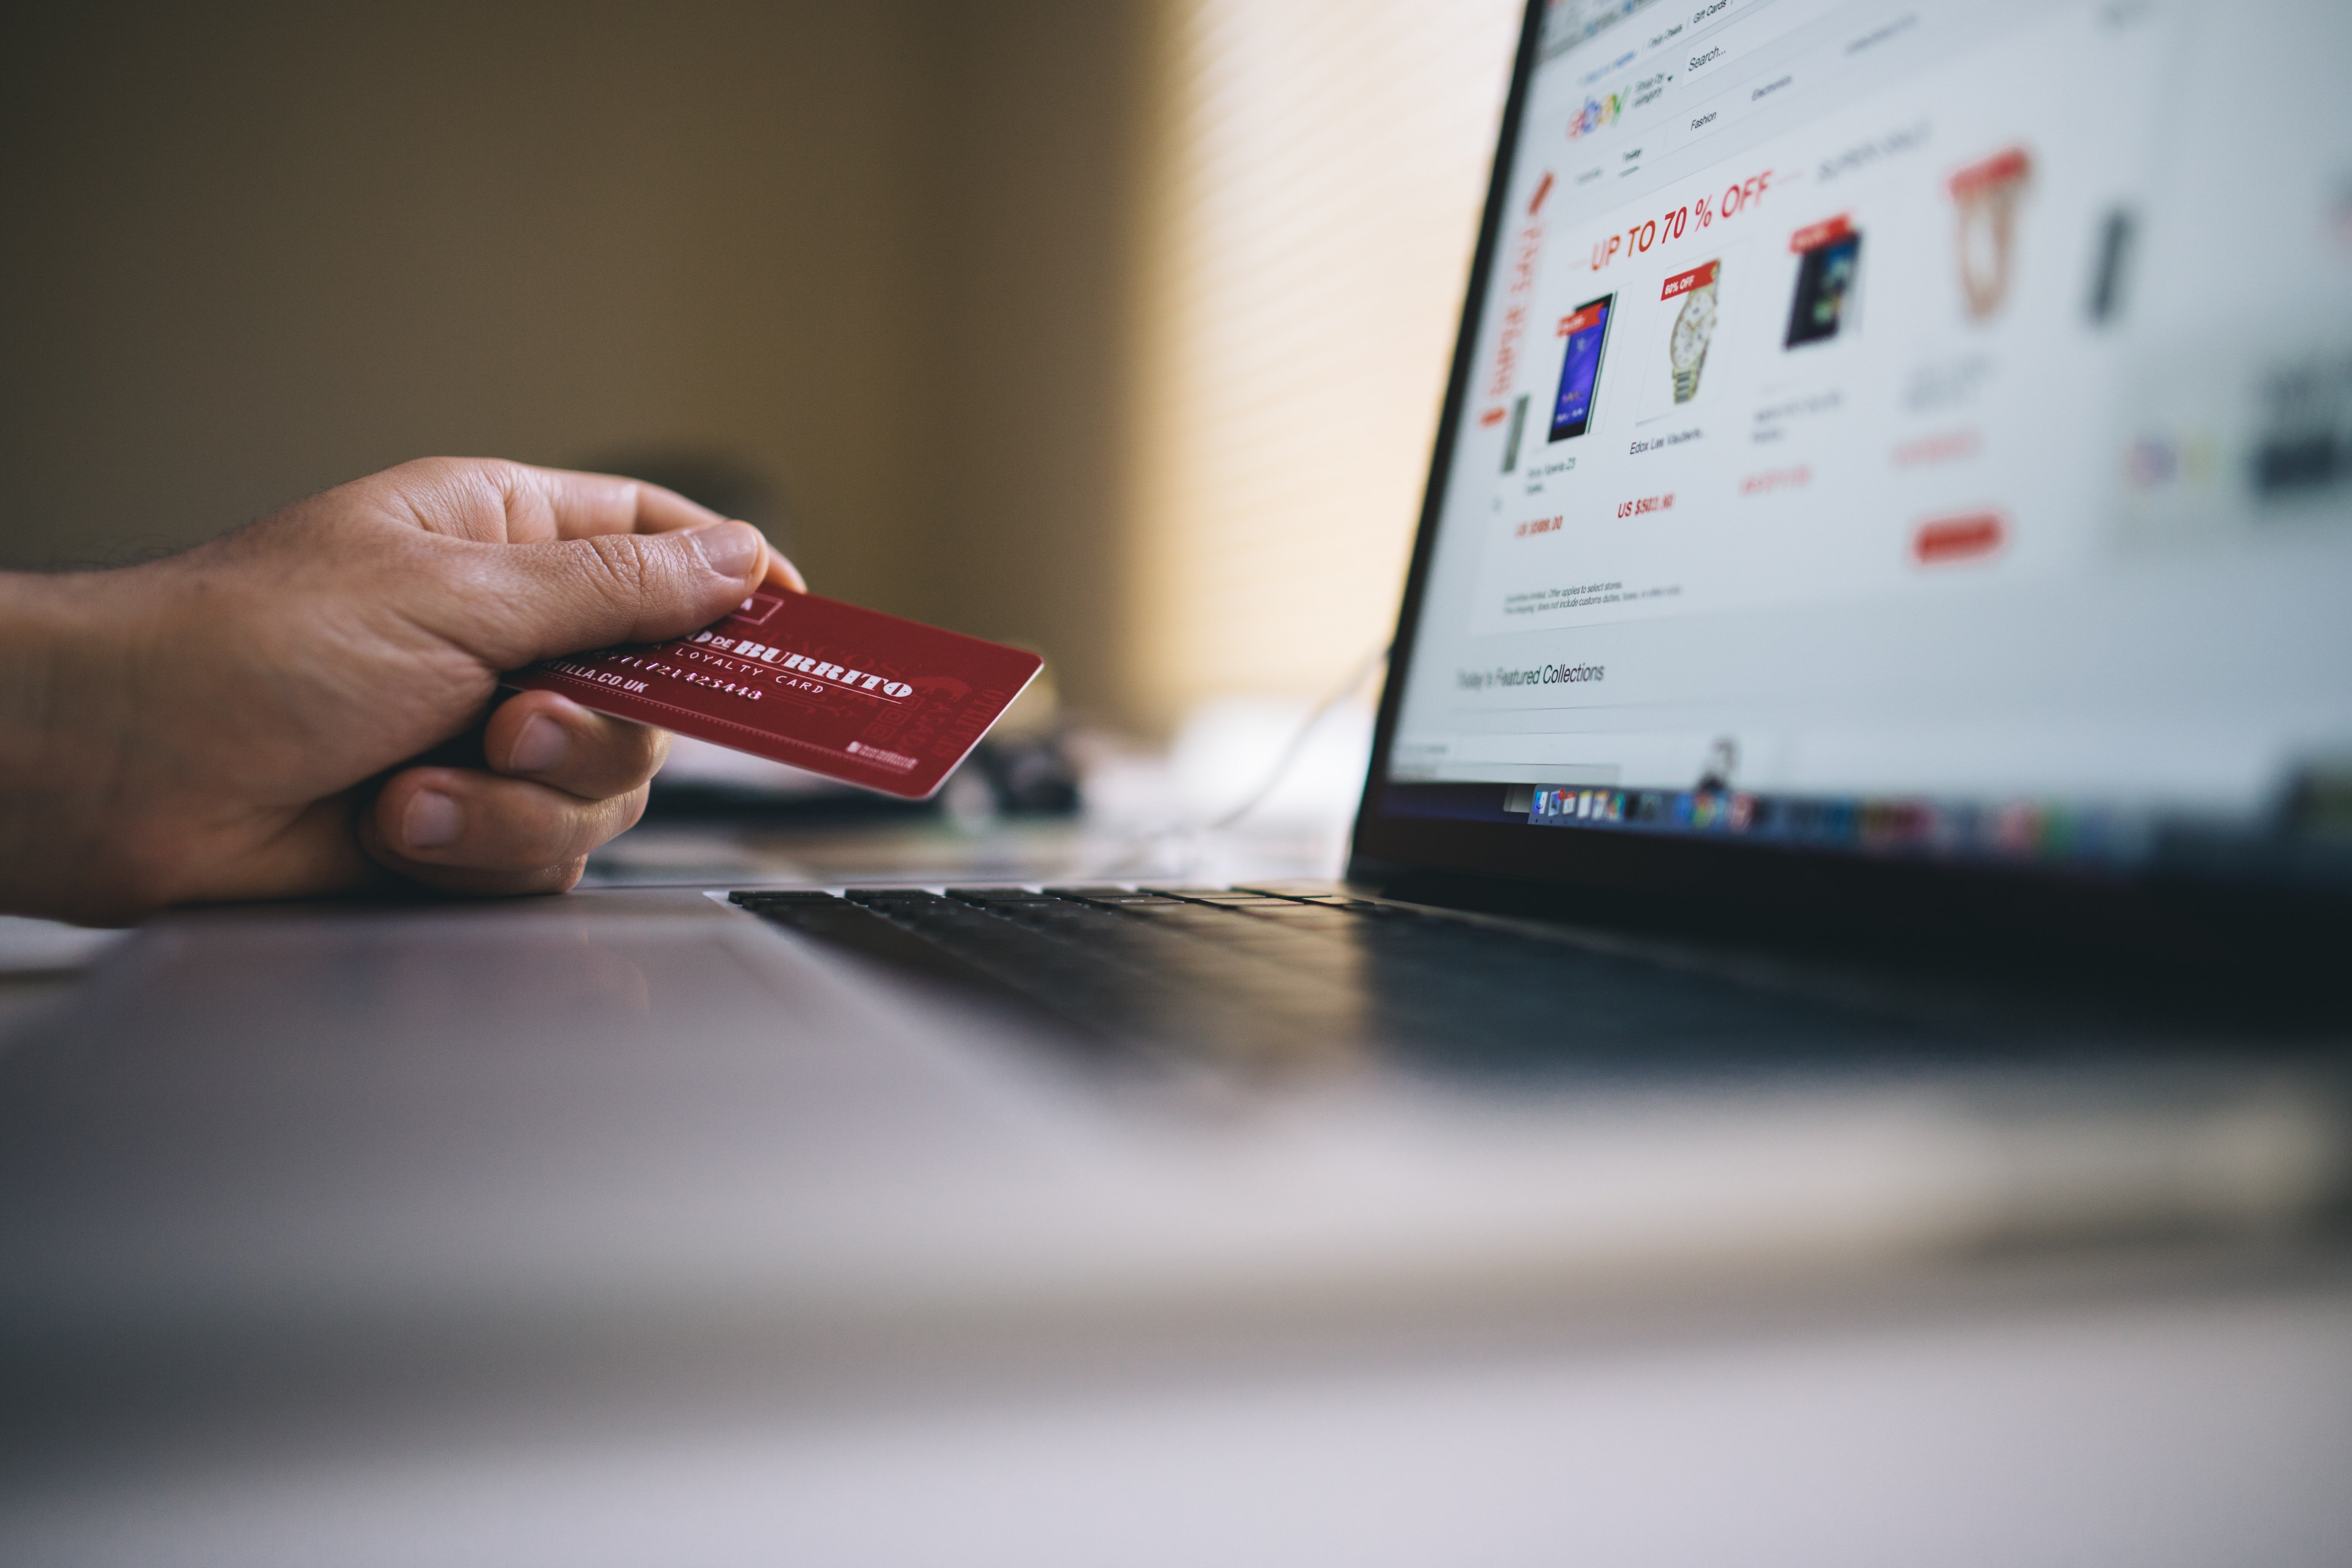 Shopping on online marketplace